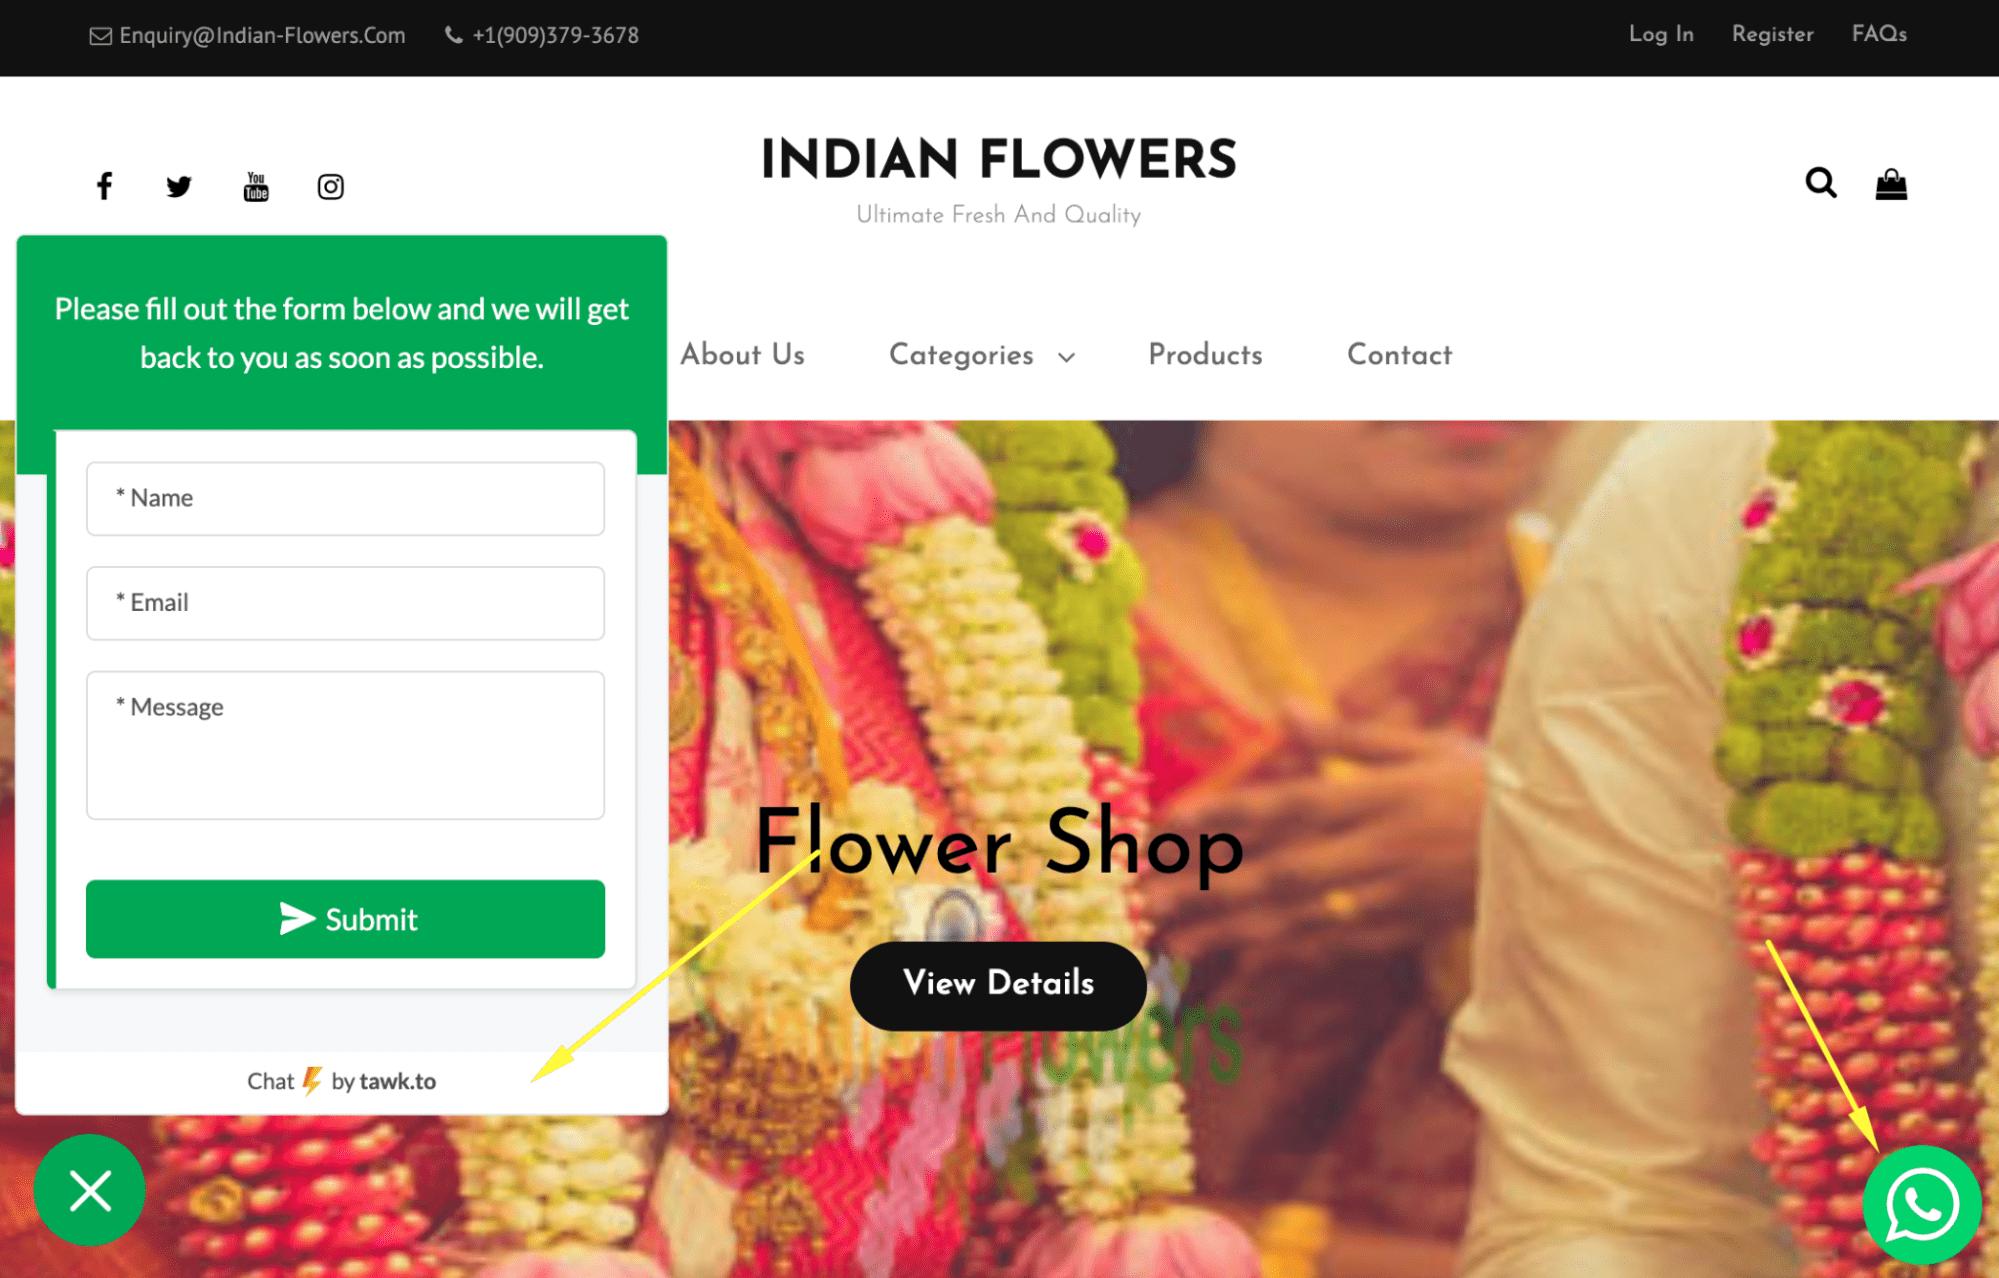 Indian Flowers website